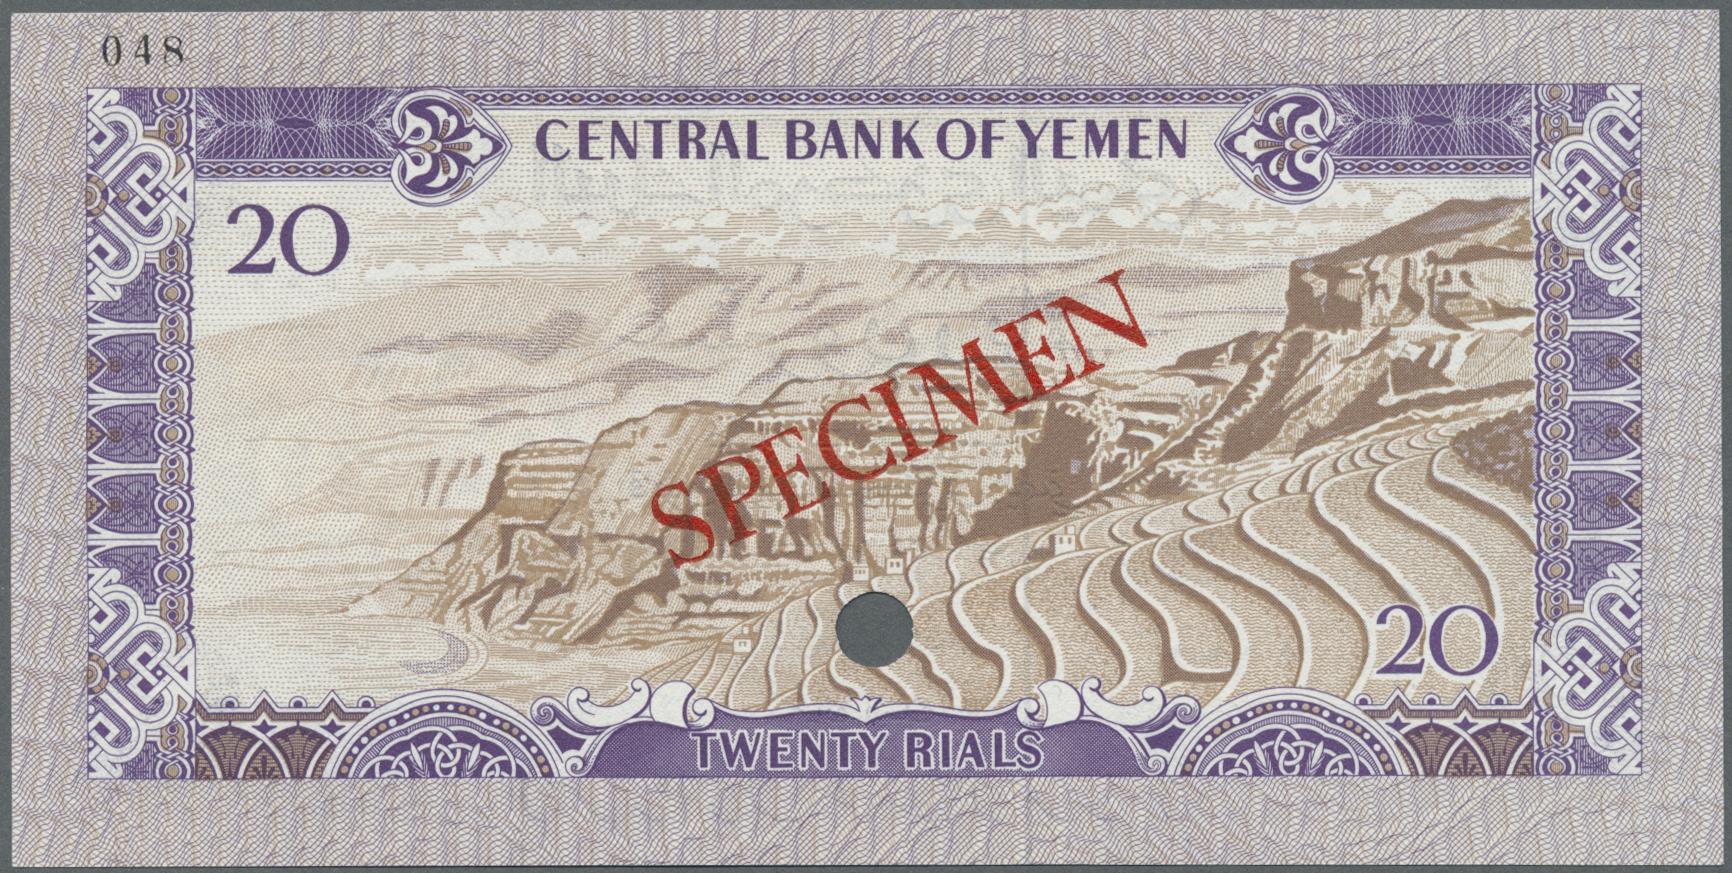 Lot 2262 - Yemen / Jemen | Banknoten  -  Auktionshaus Christoph Gärtner GmbH & Co. KG Banknotes & Coins Auction #39 Day 2